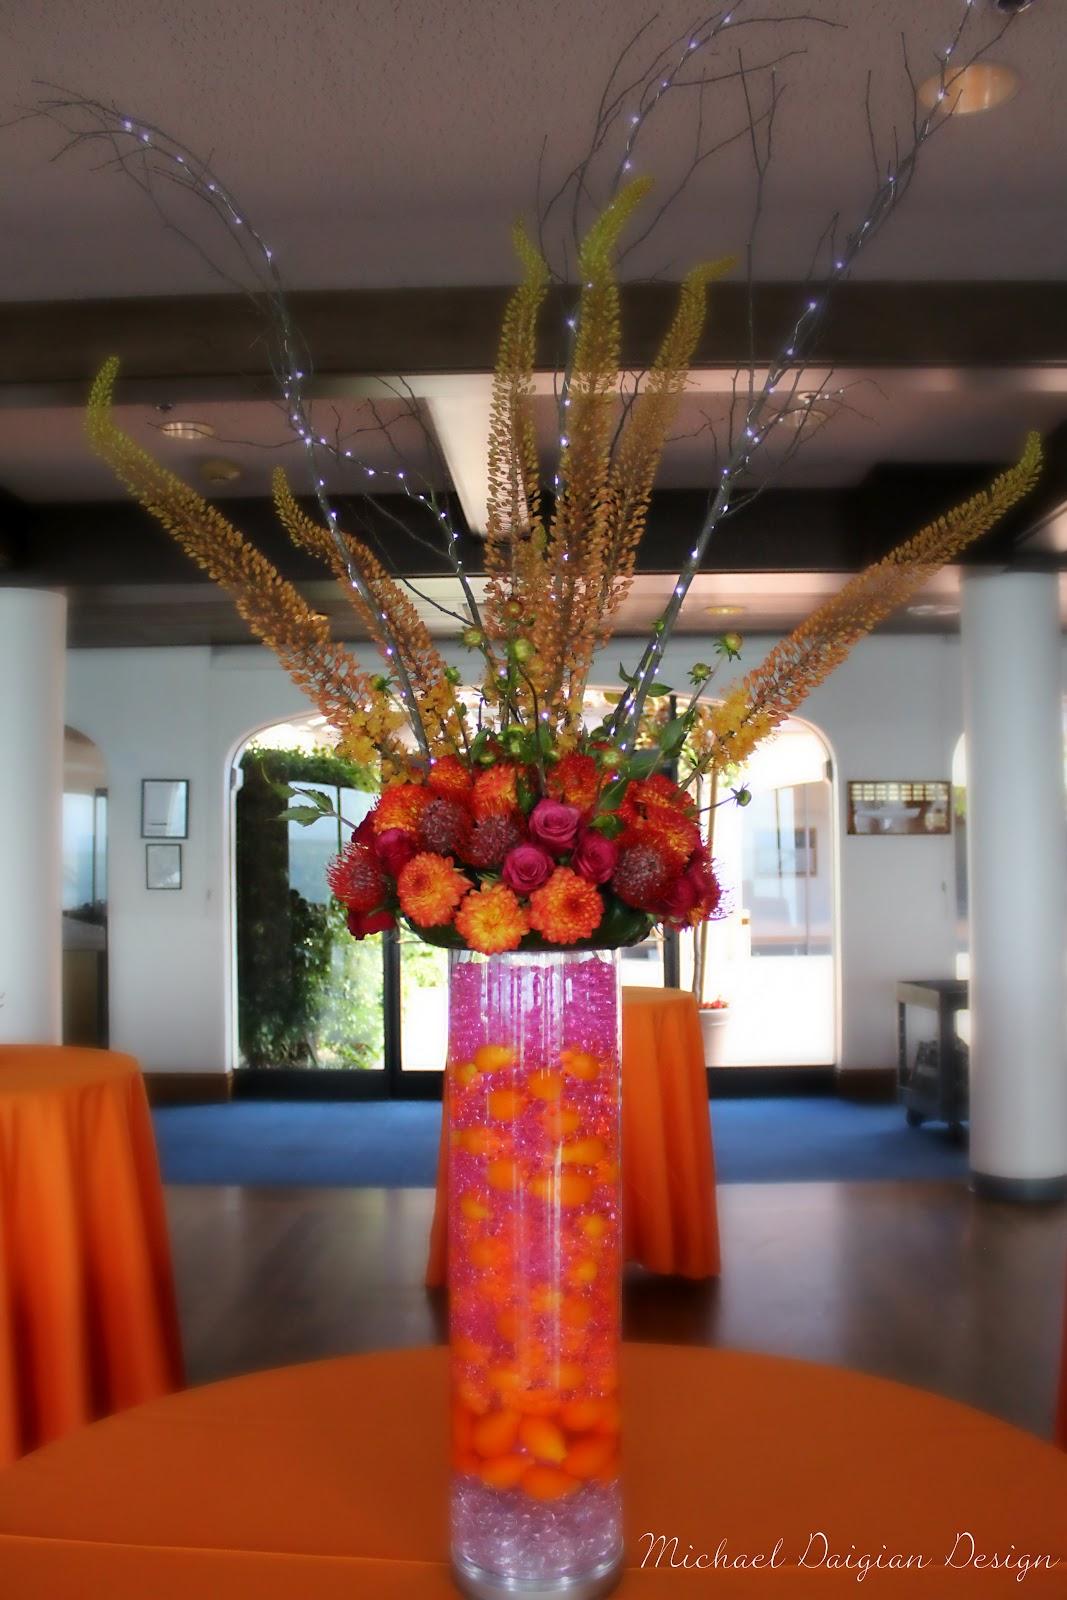 Elegant Party Decorations 50th Birthday michael daigian design: 50th birthday party